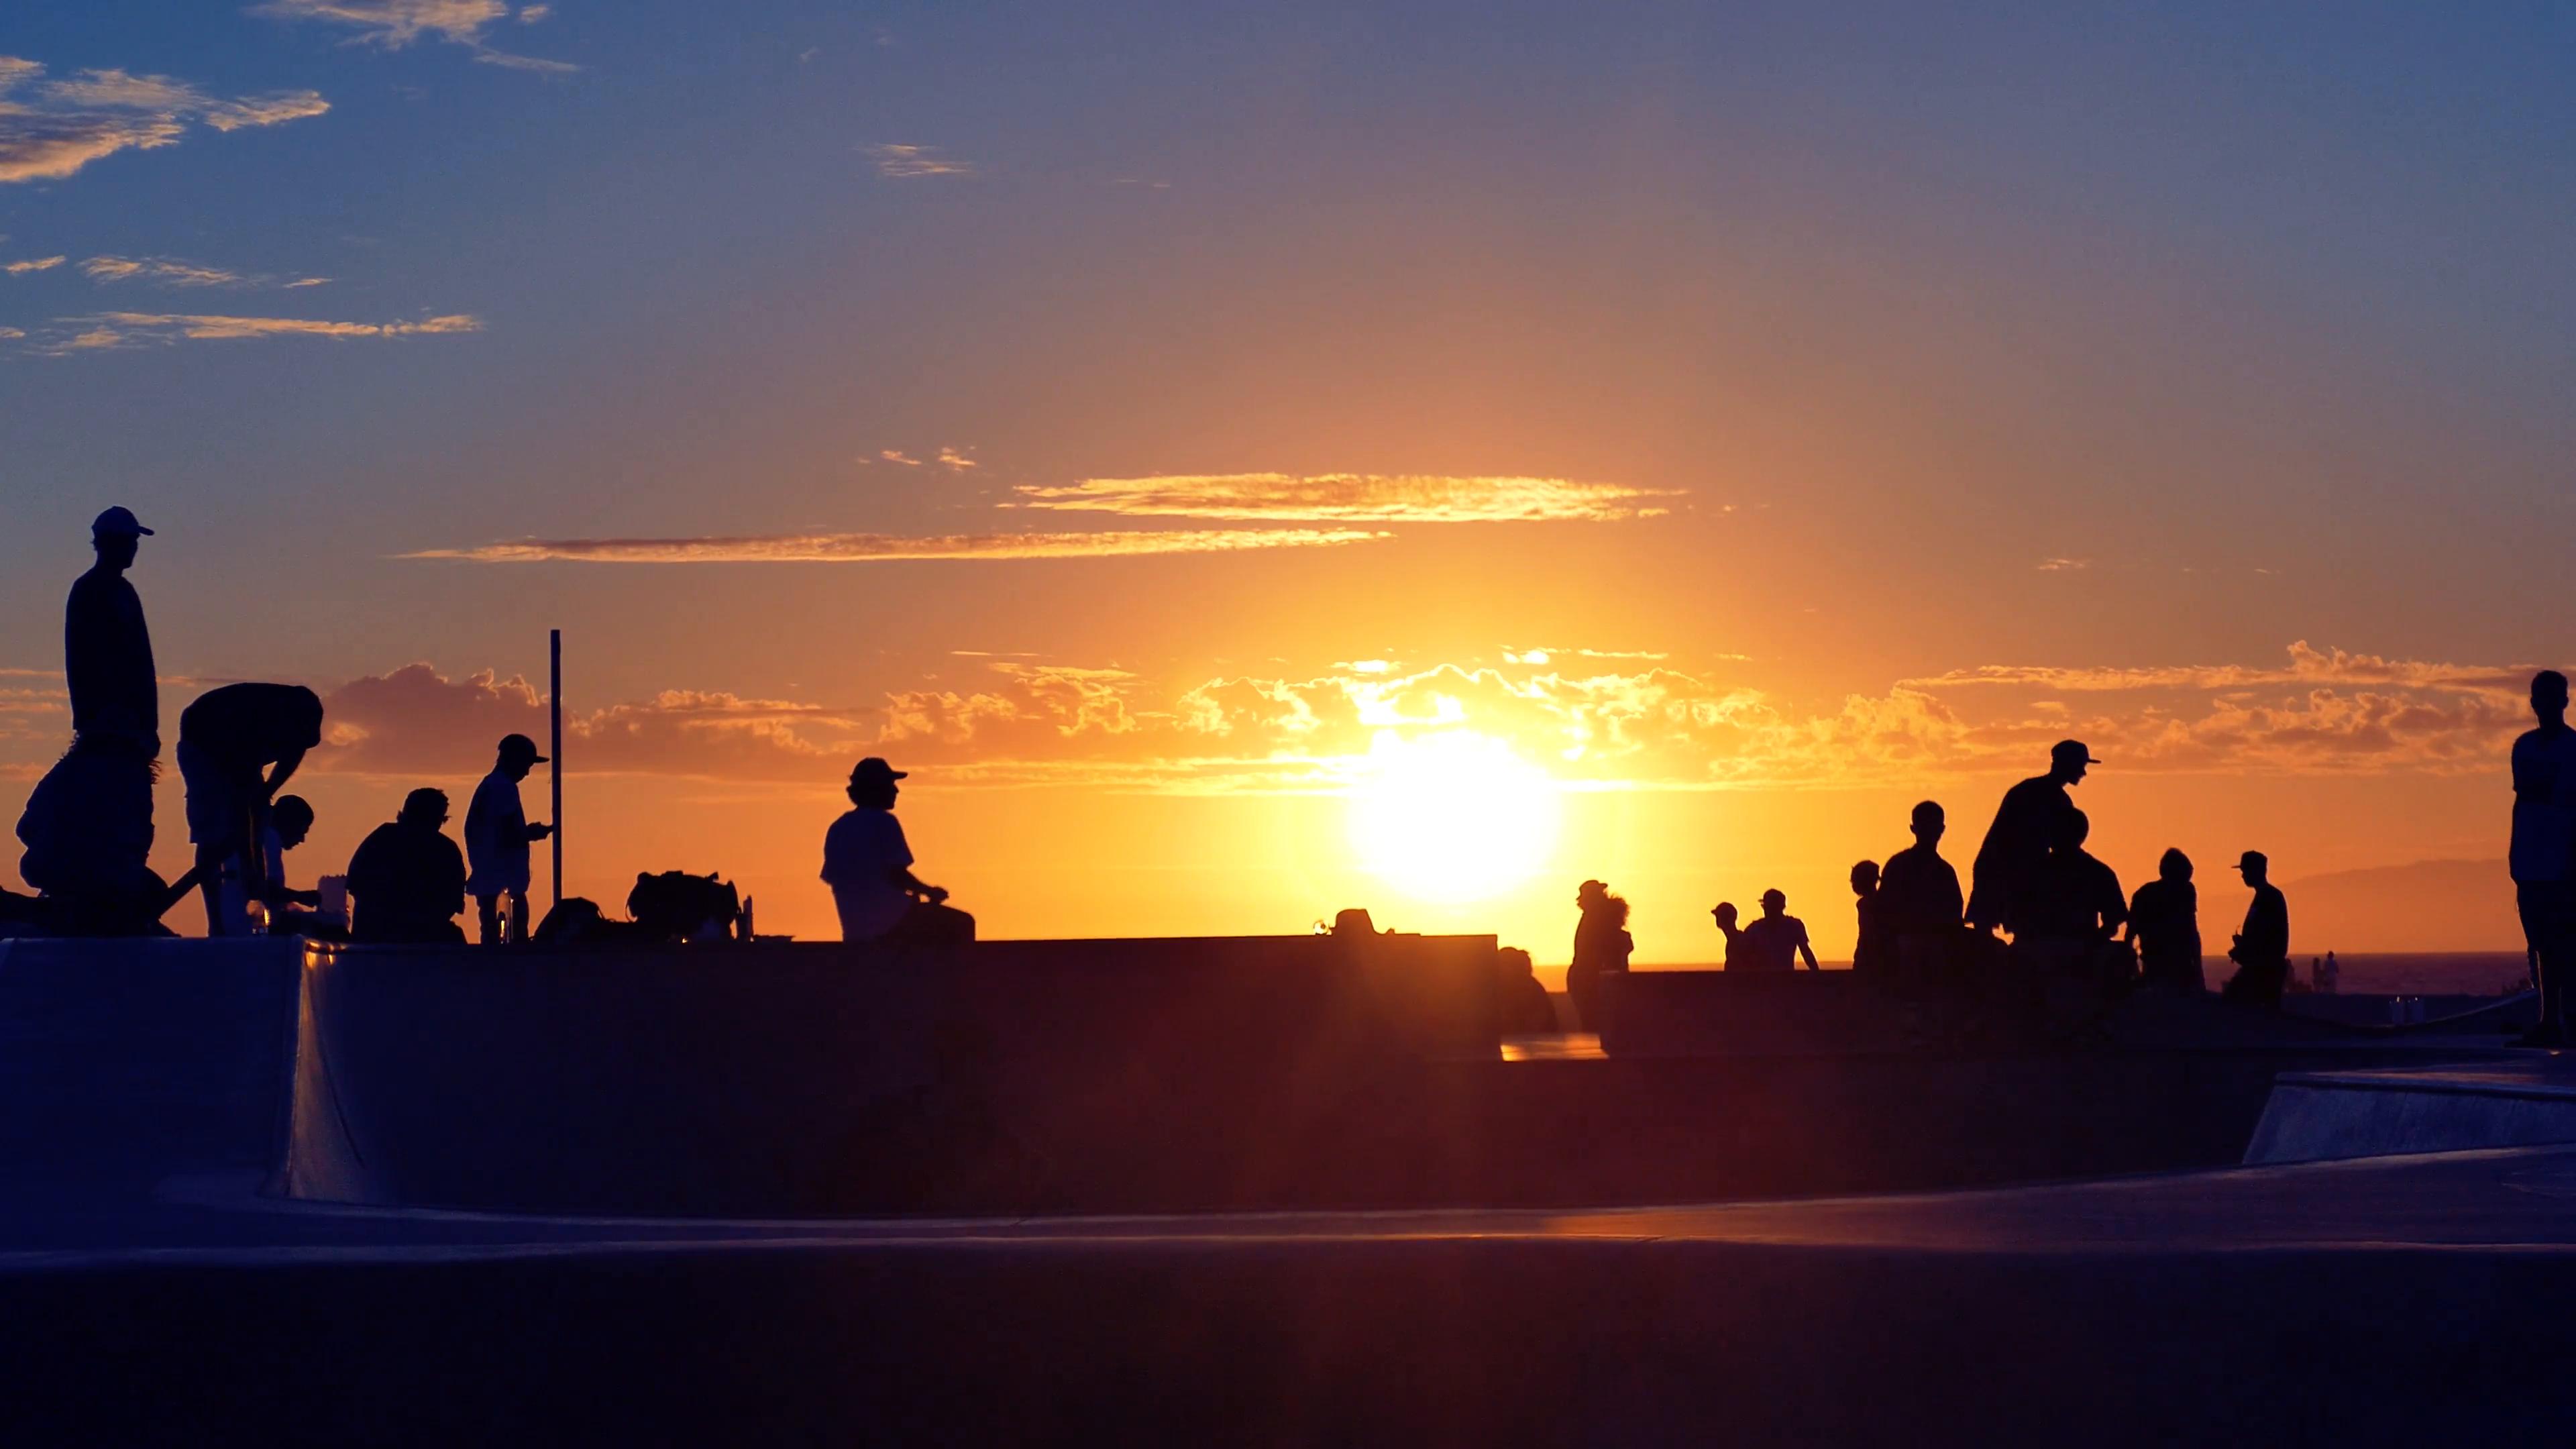 Silhouette People Skateboarding Extreme Skatepark Footage Sunset ...